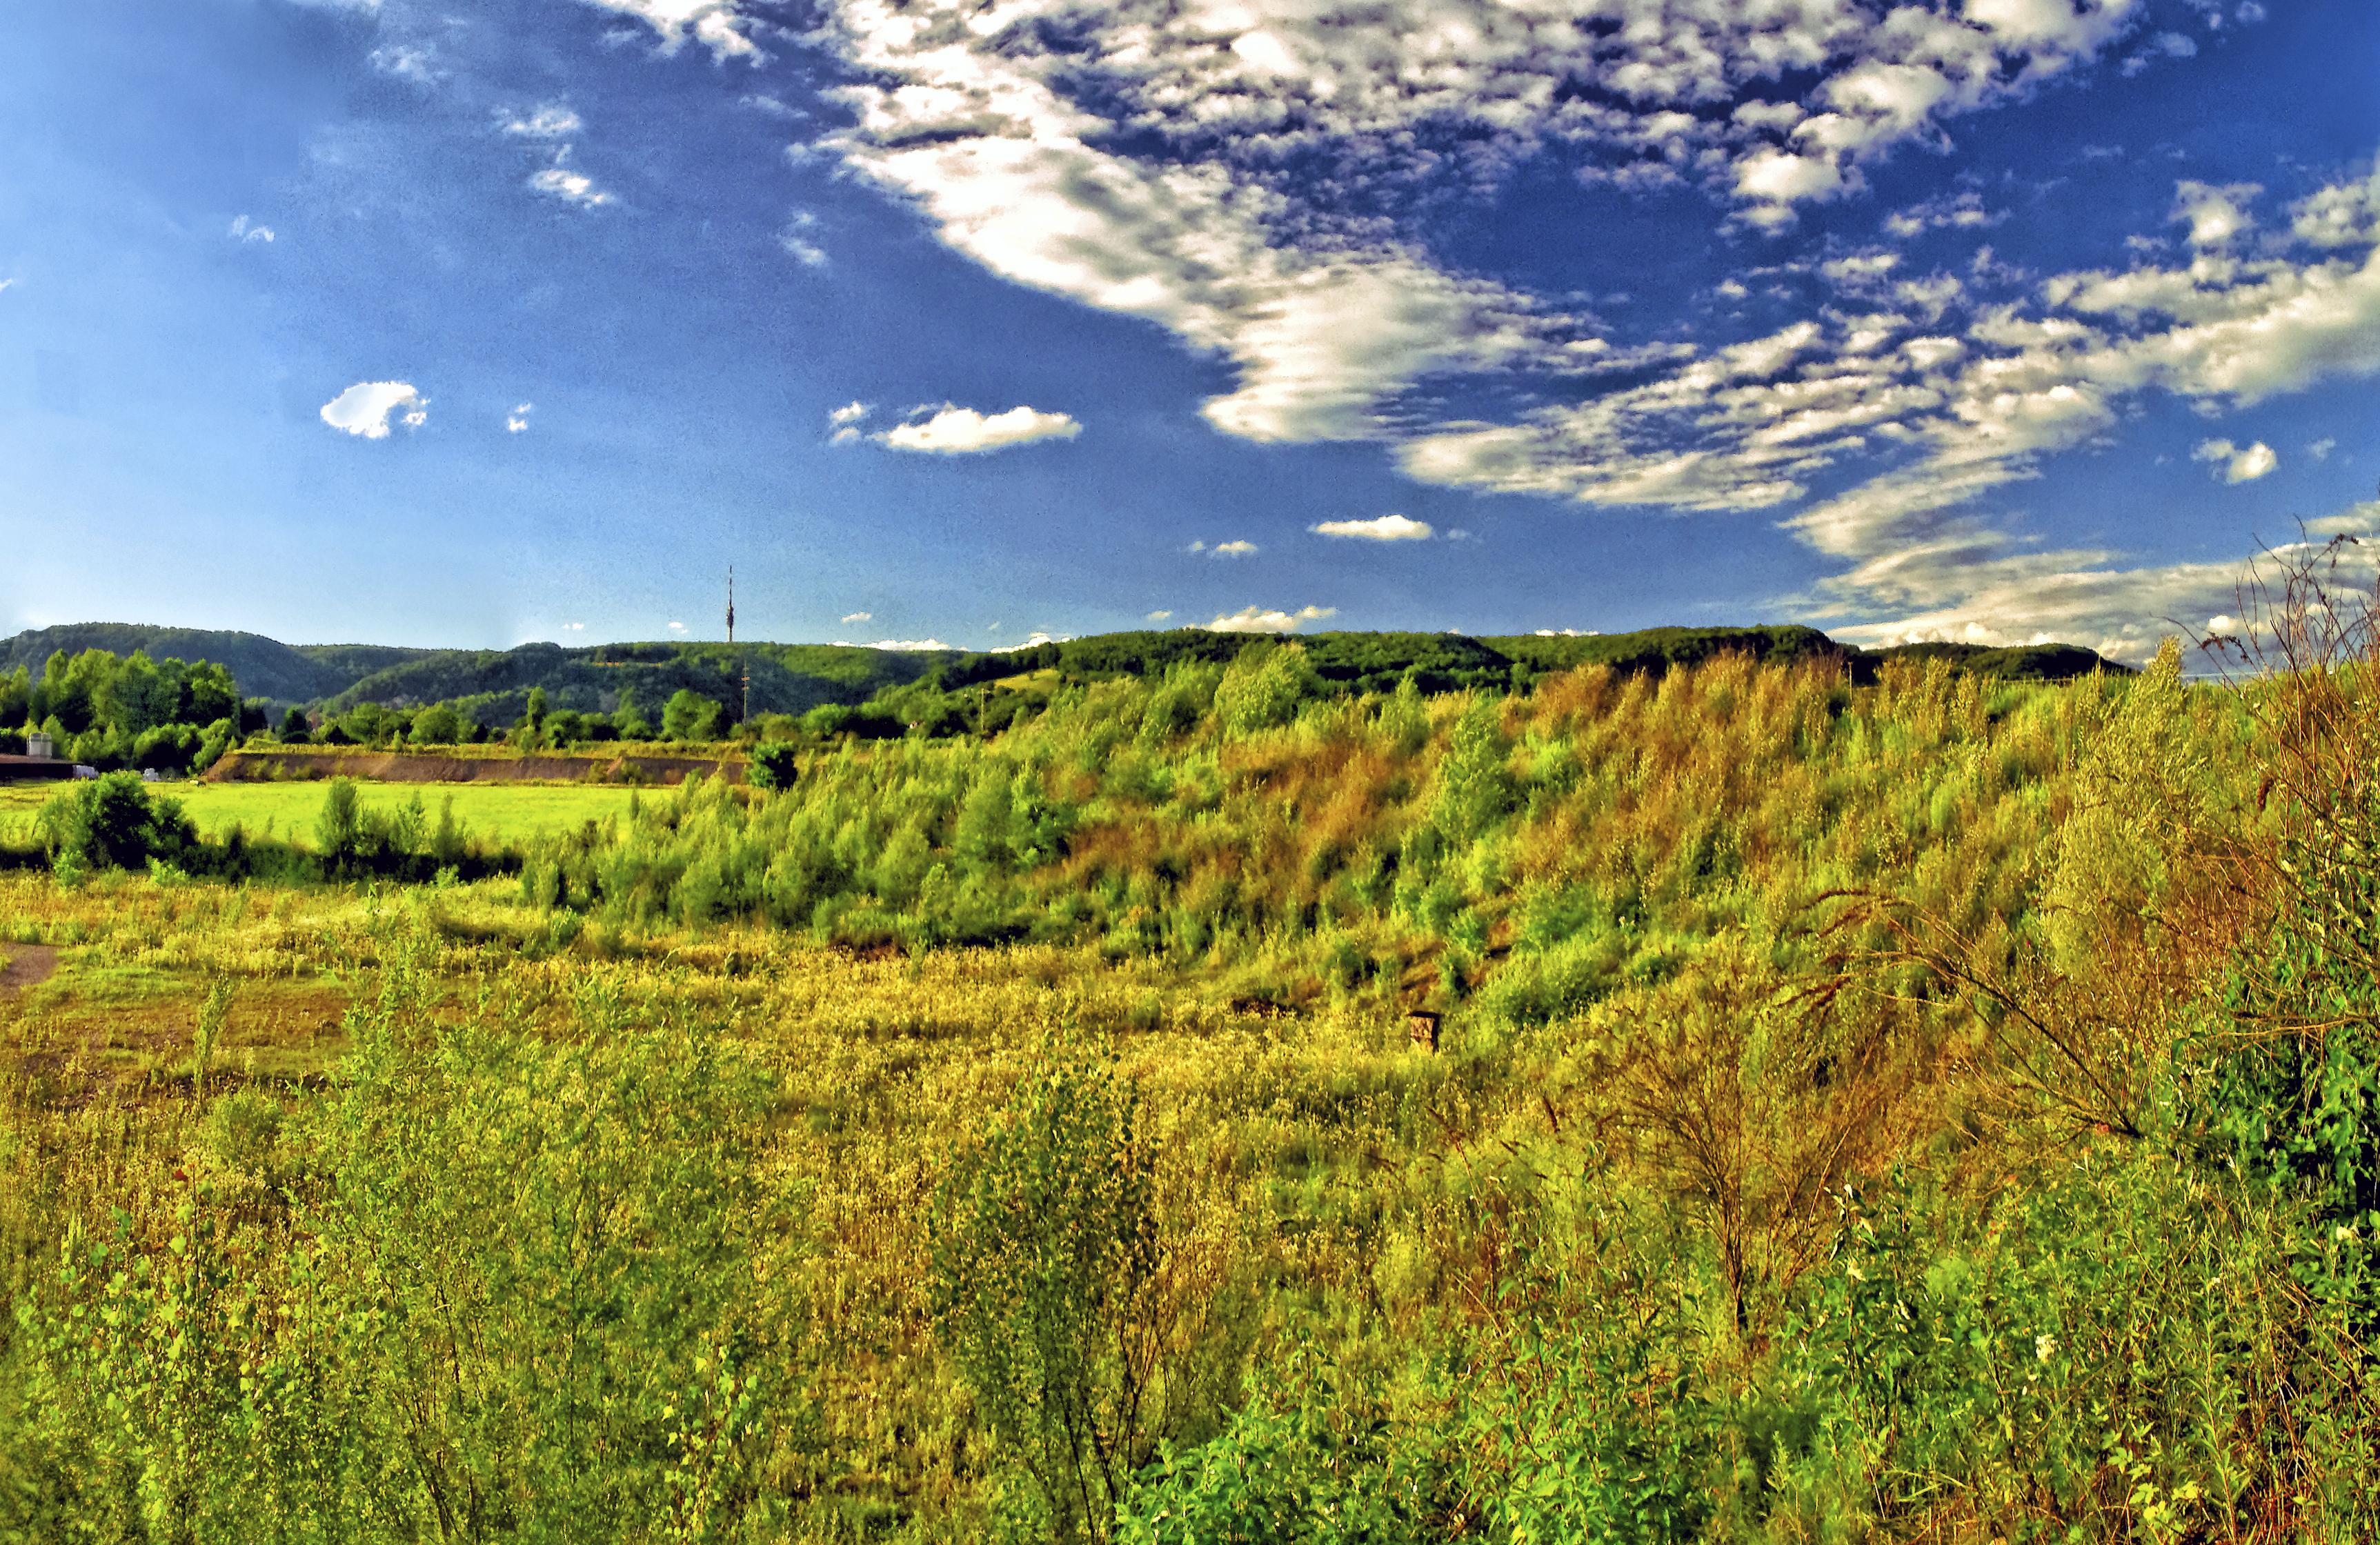 geotope, Grenzach-Wyhlen